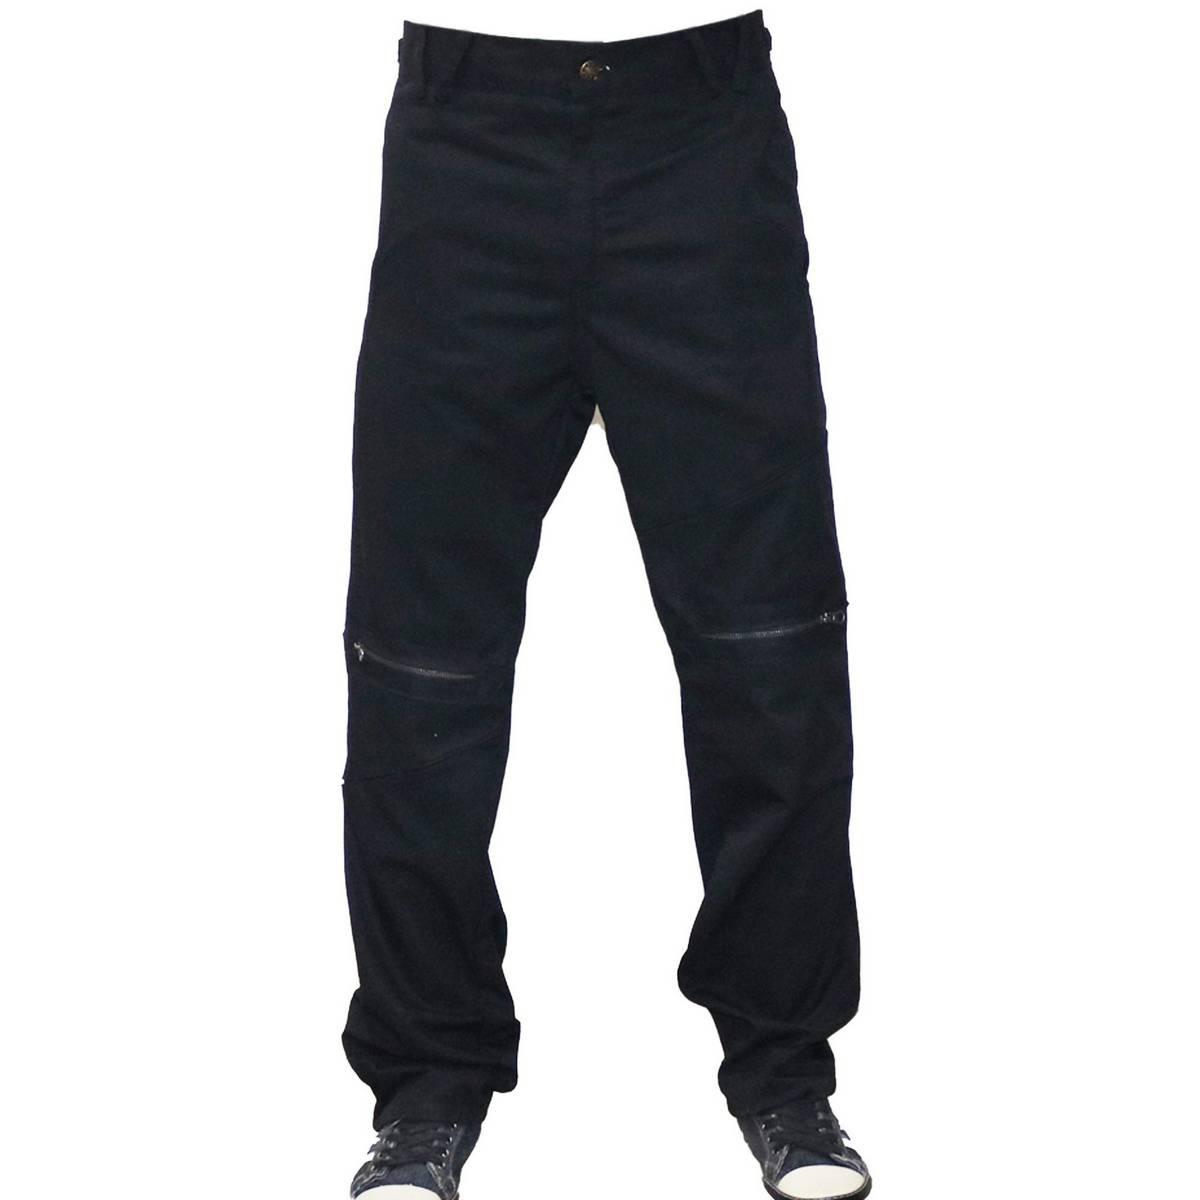 Decent Black Cargo Pants For Men - Cargo Trousers